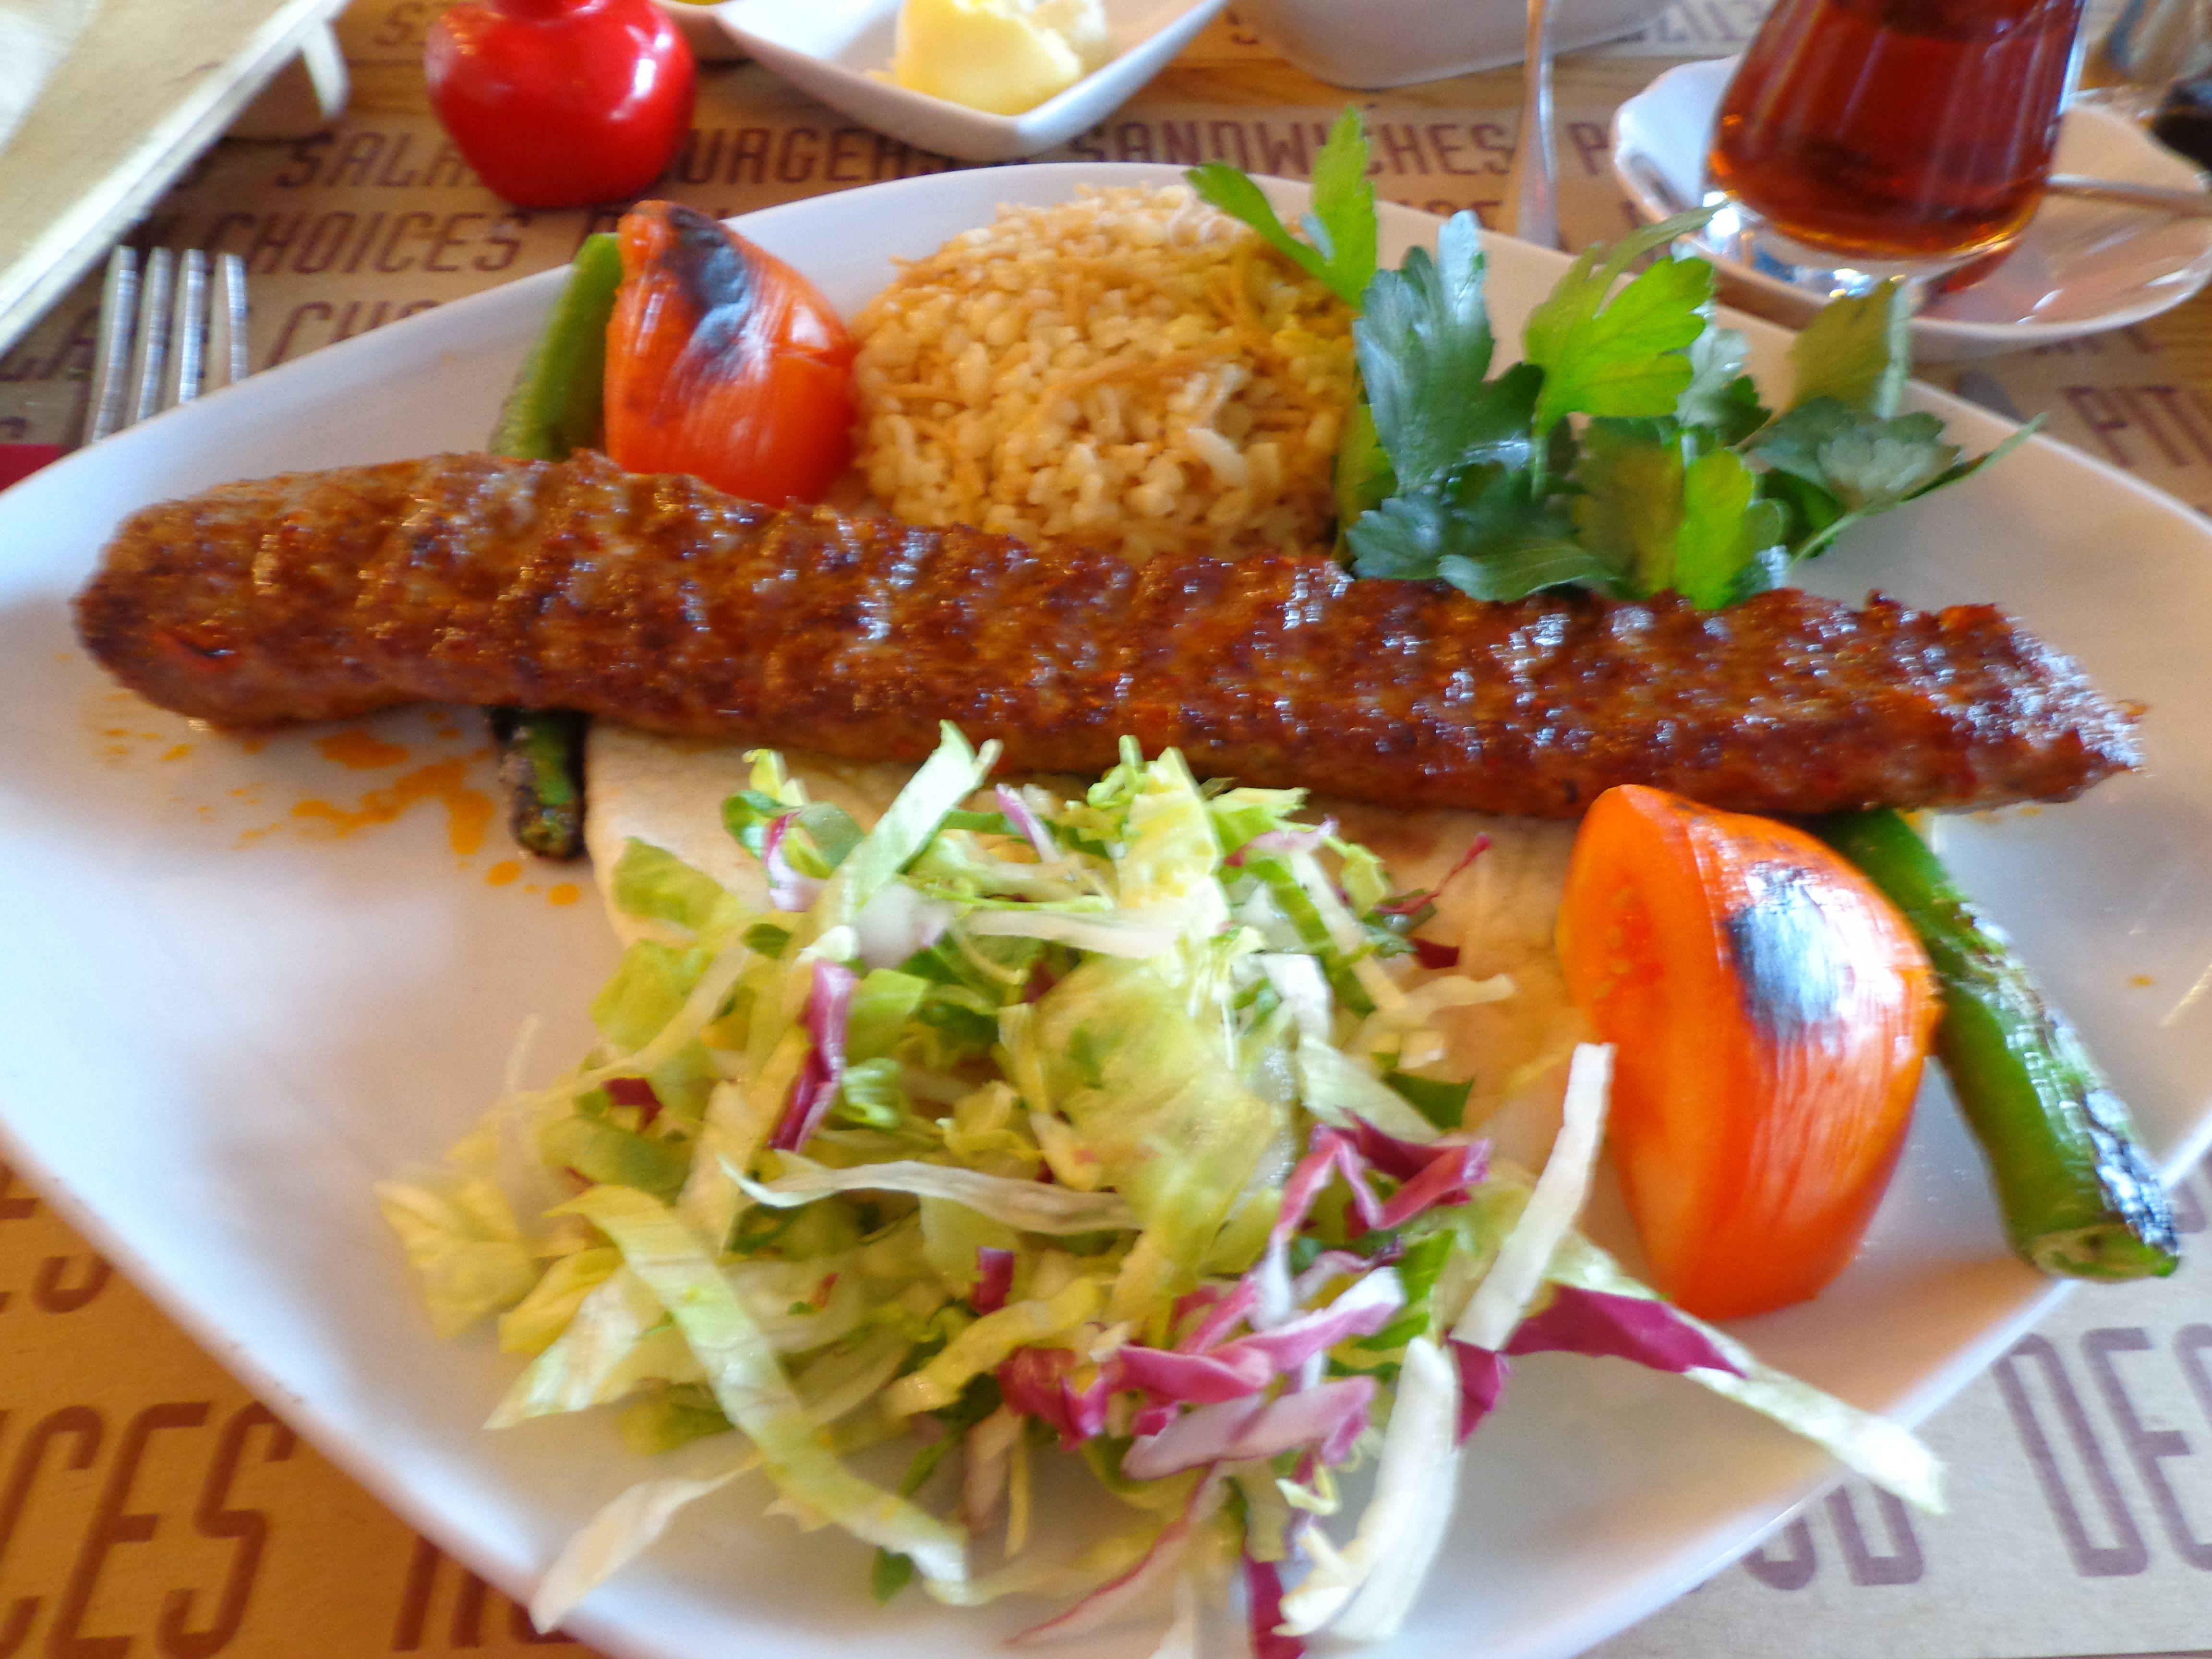 Adana Usulu Acisiz Kebap The So Called Kebap From Adana With